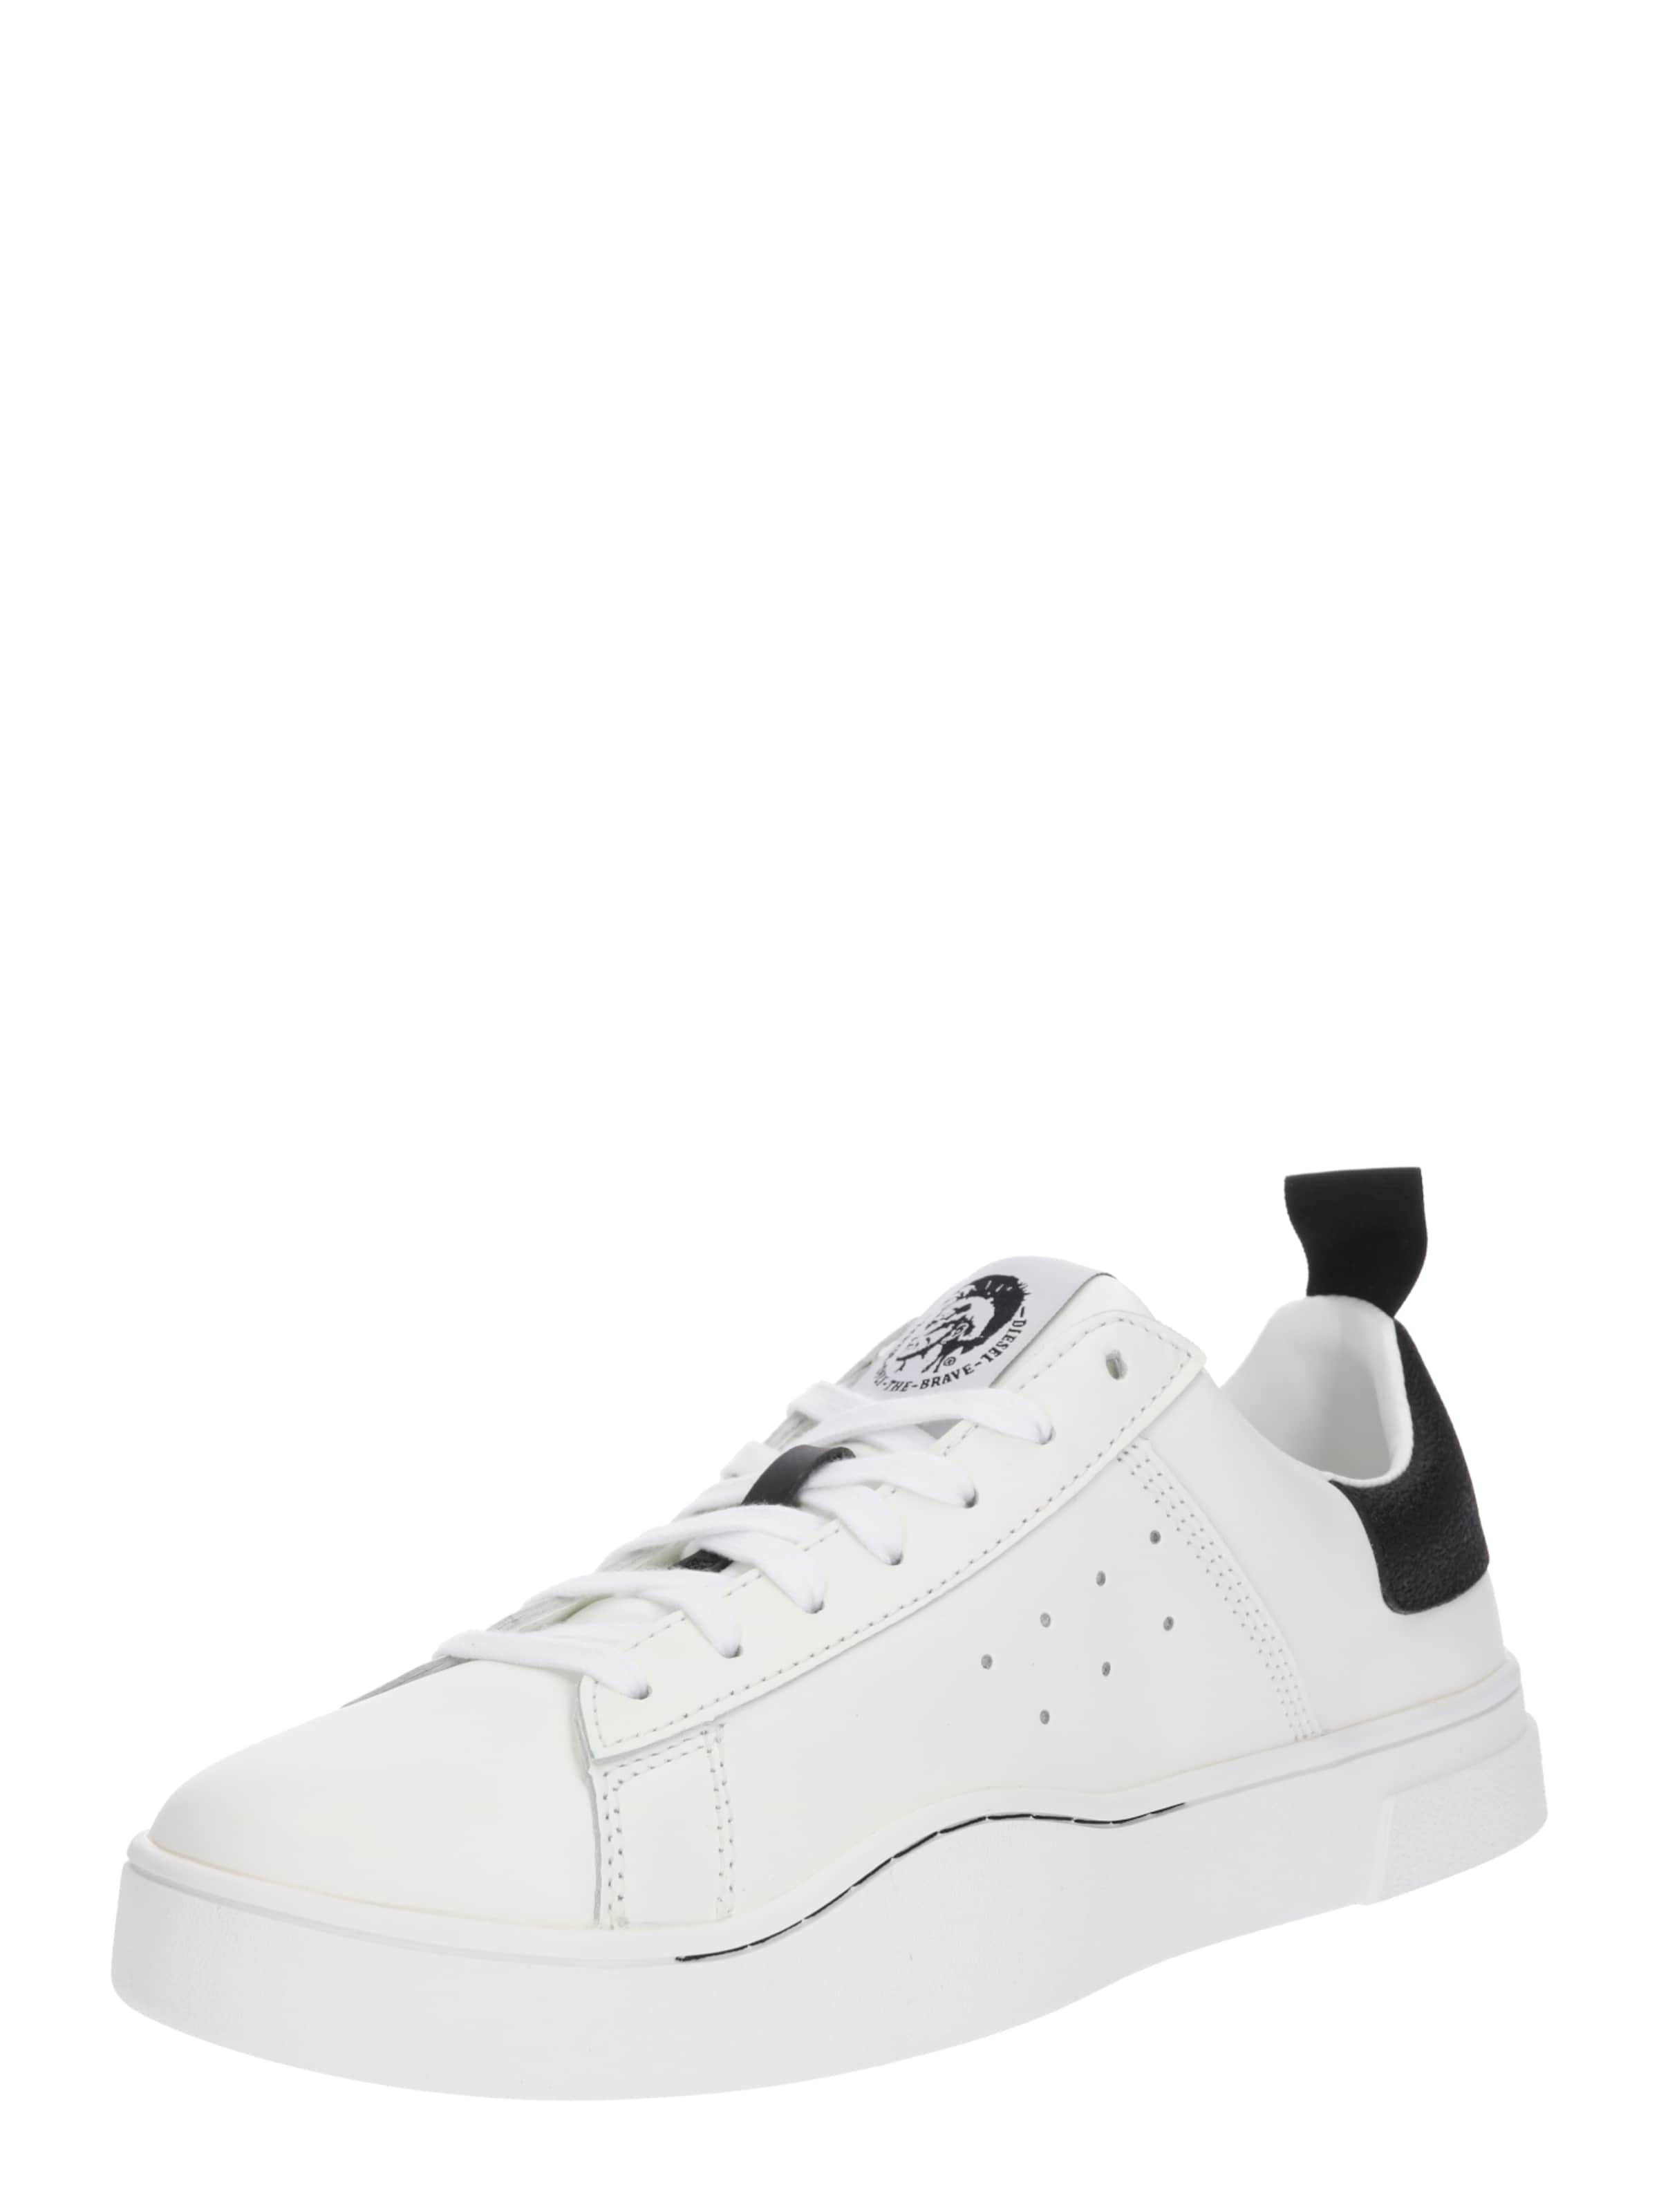 DIESEL Sneaker S-CLEVER LOW Verschleißfeste billige Schuhe